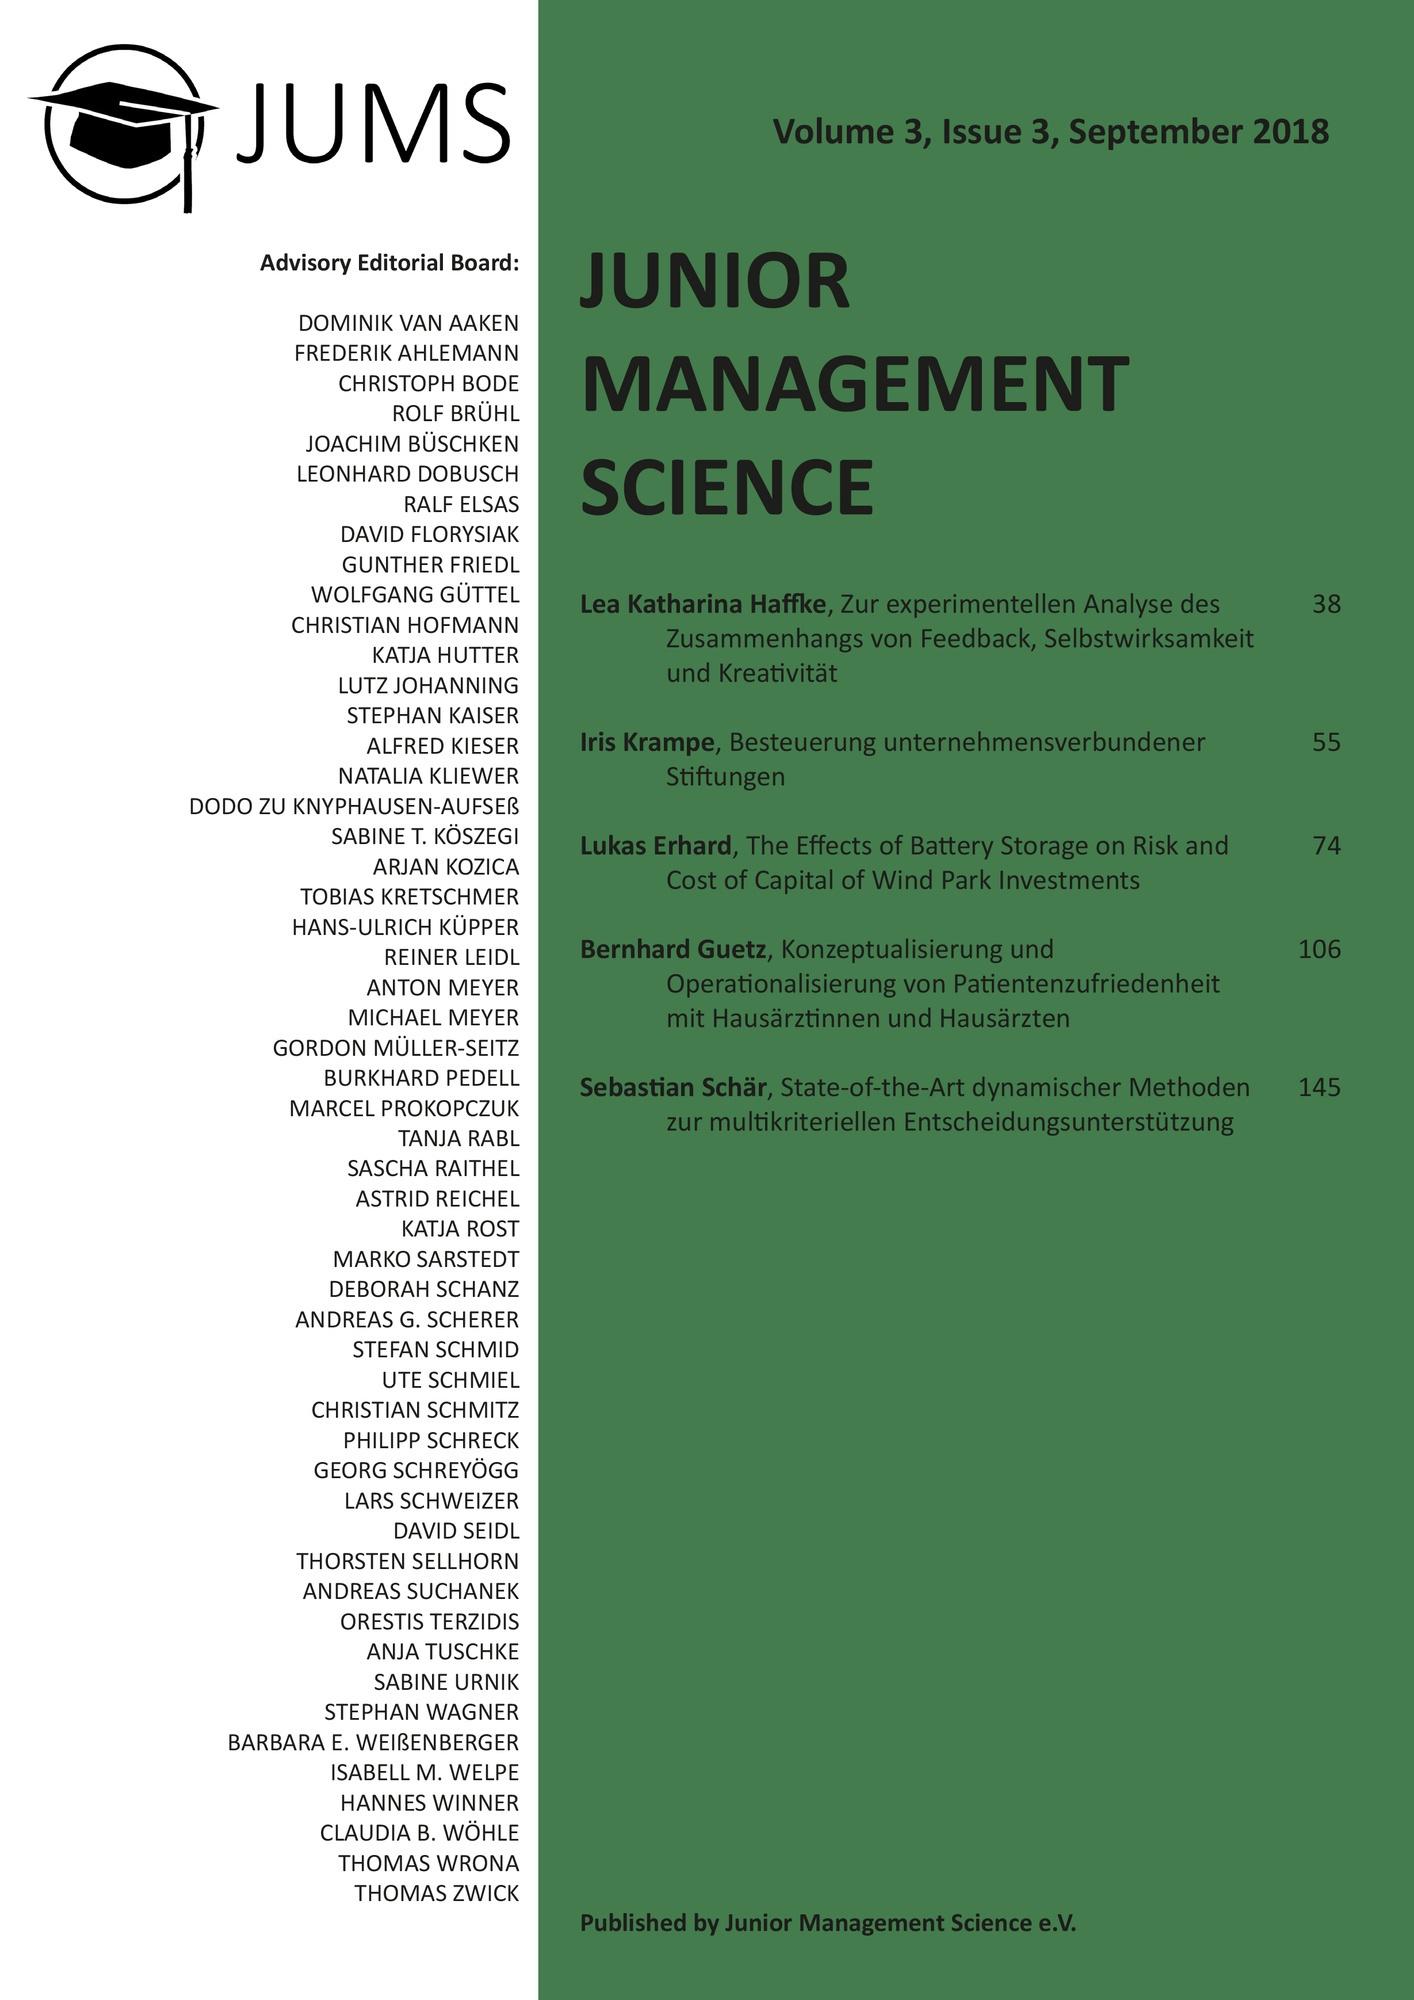 Titel: Junior Management Science, Volume 3, Issue 3, September 2018